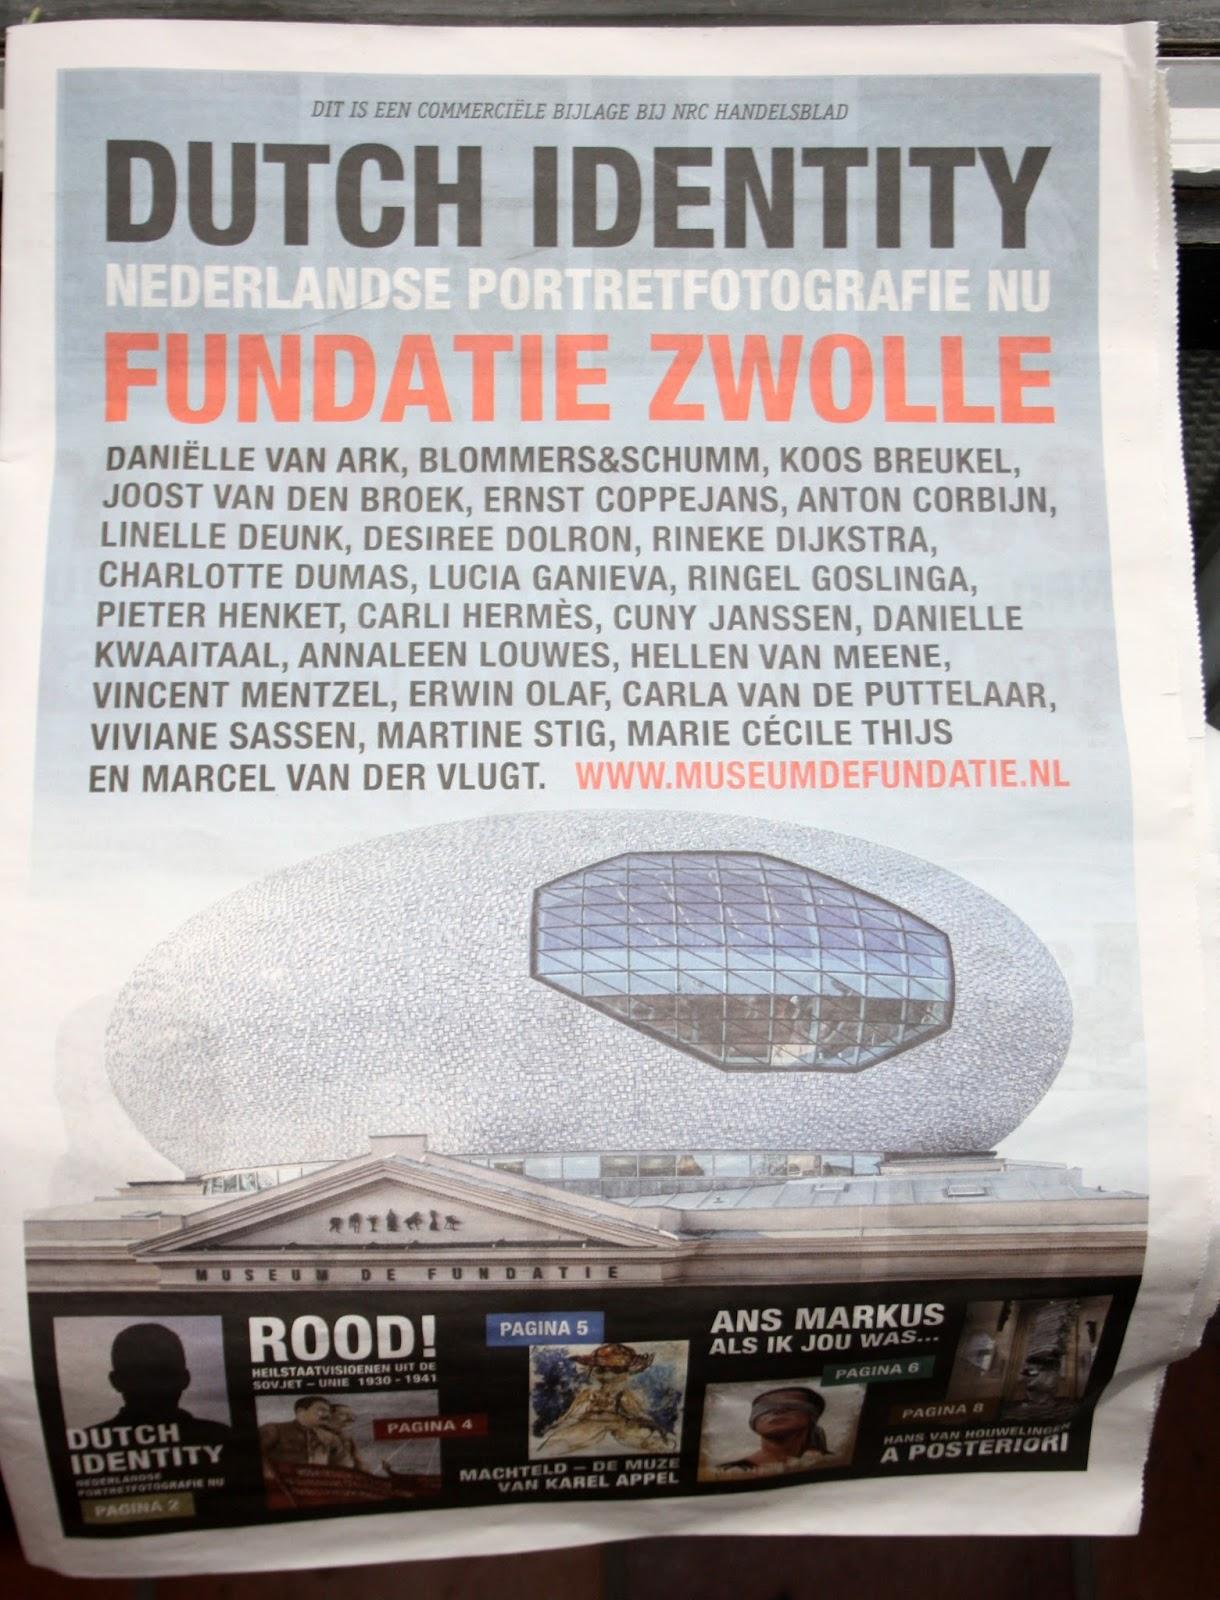 Citaten Uit Bint : Bint photobooks on internet dutch identity contemporary dutch